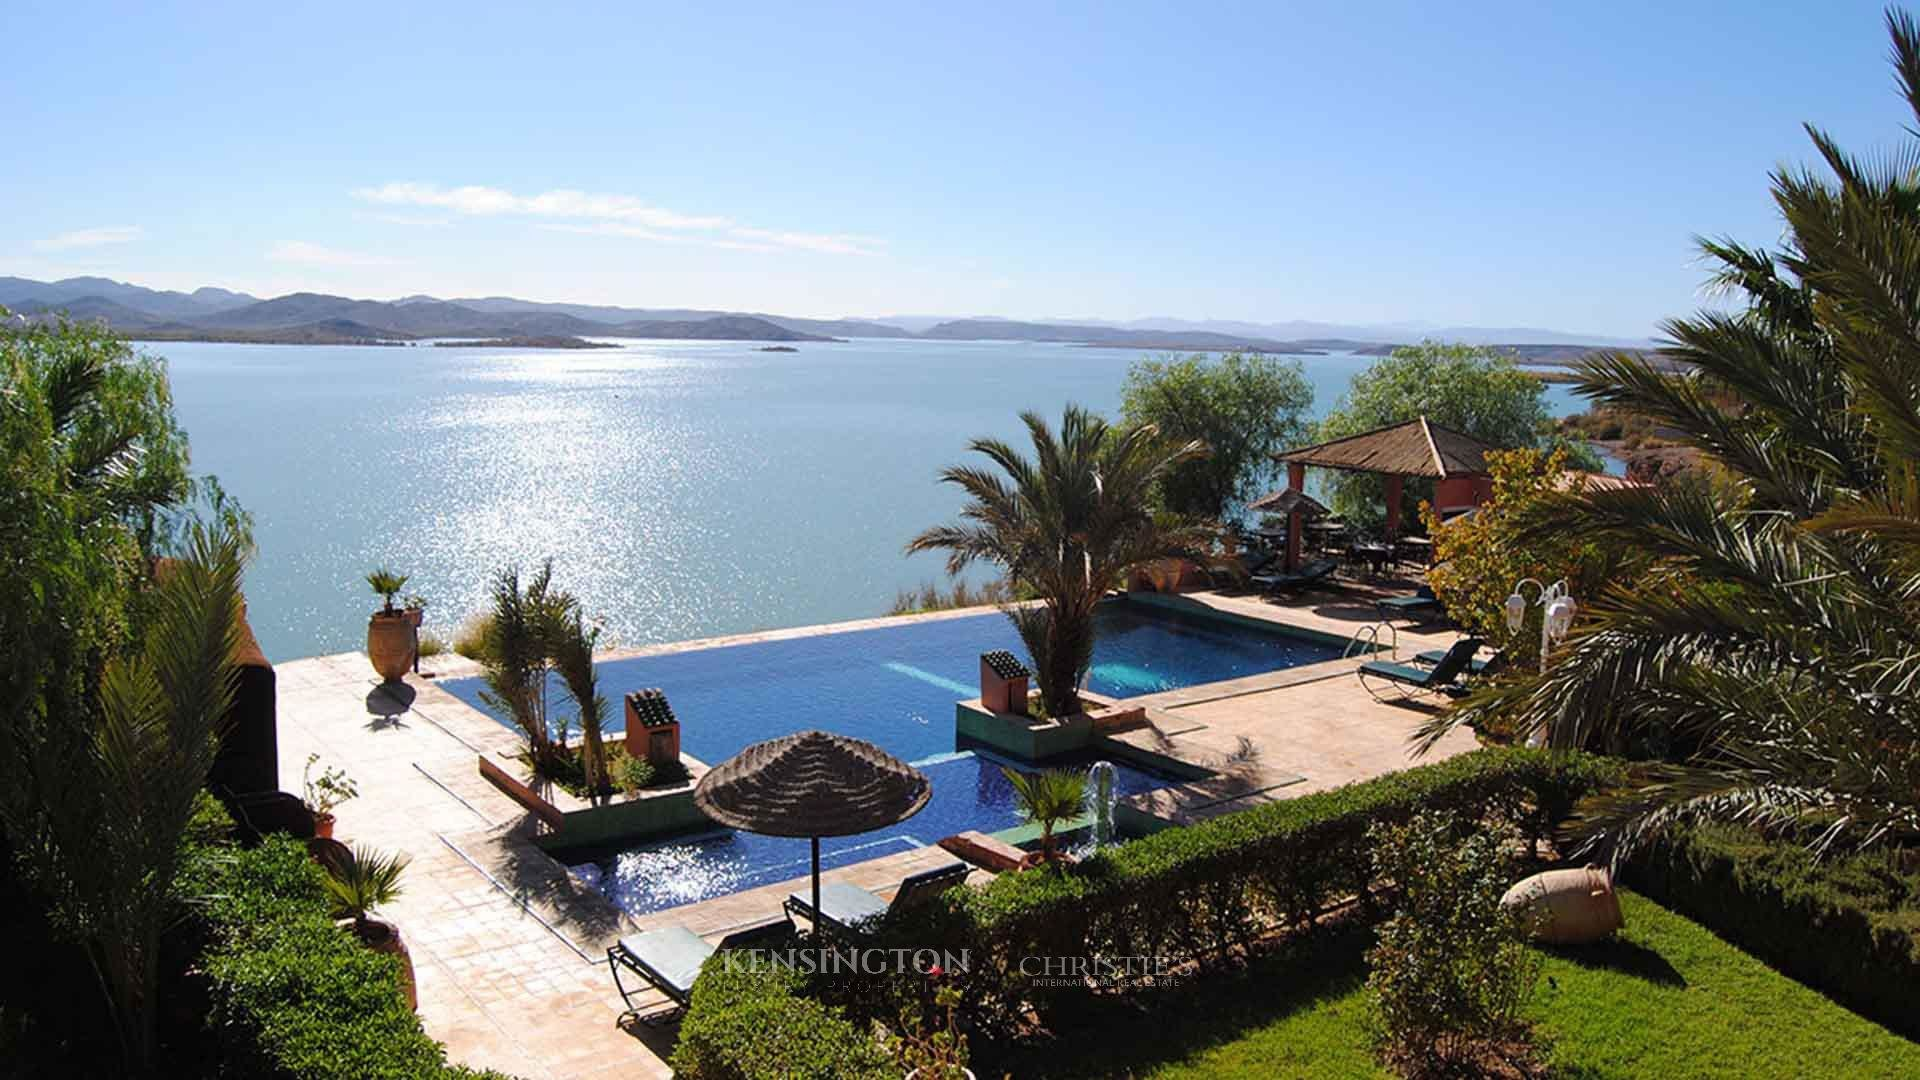 KPPM01014: Villa Tourmal Luxury Villa Ouarzazate Morocco